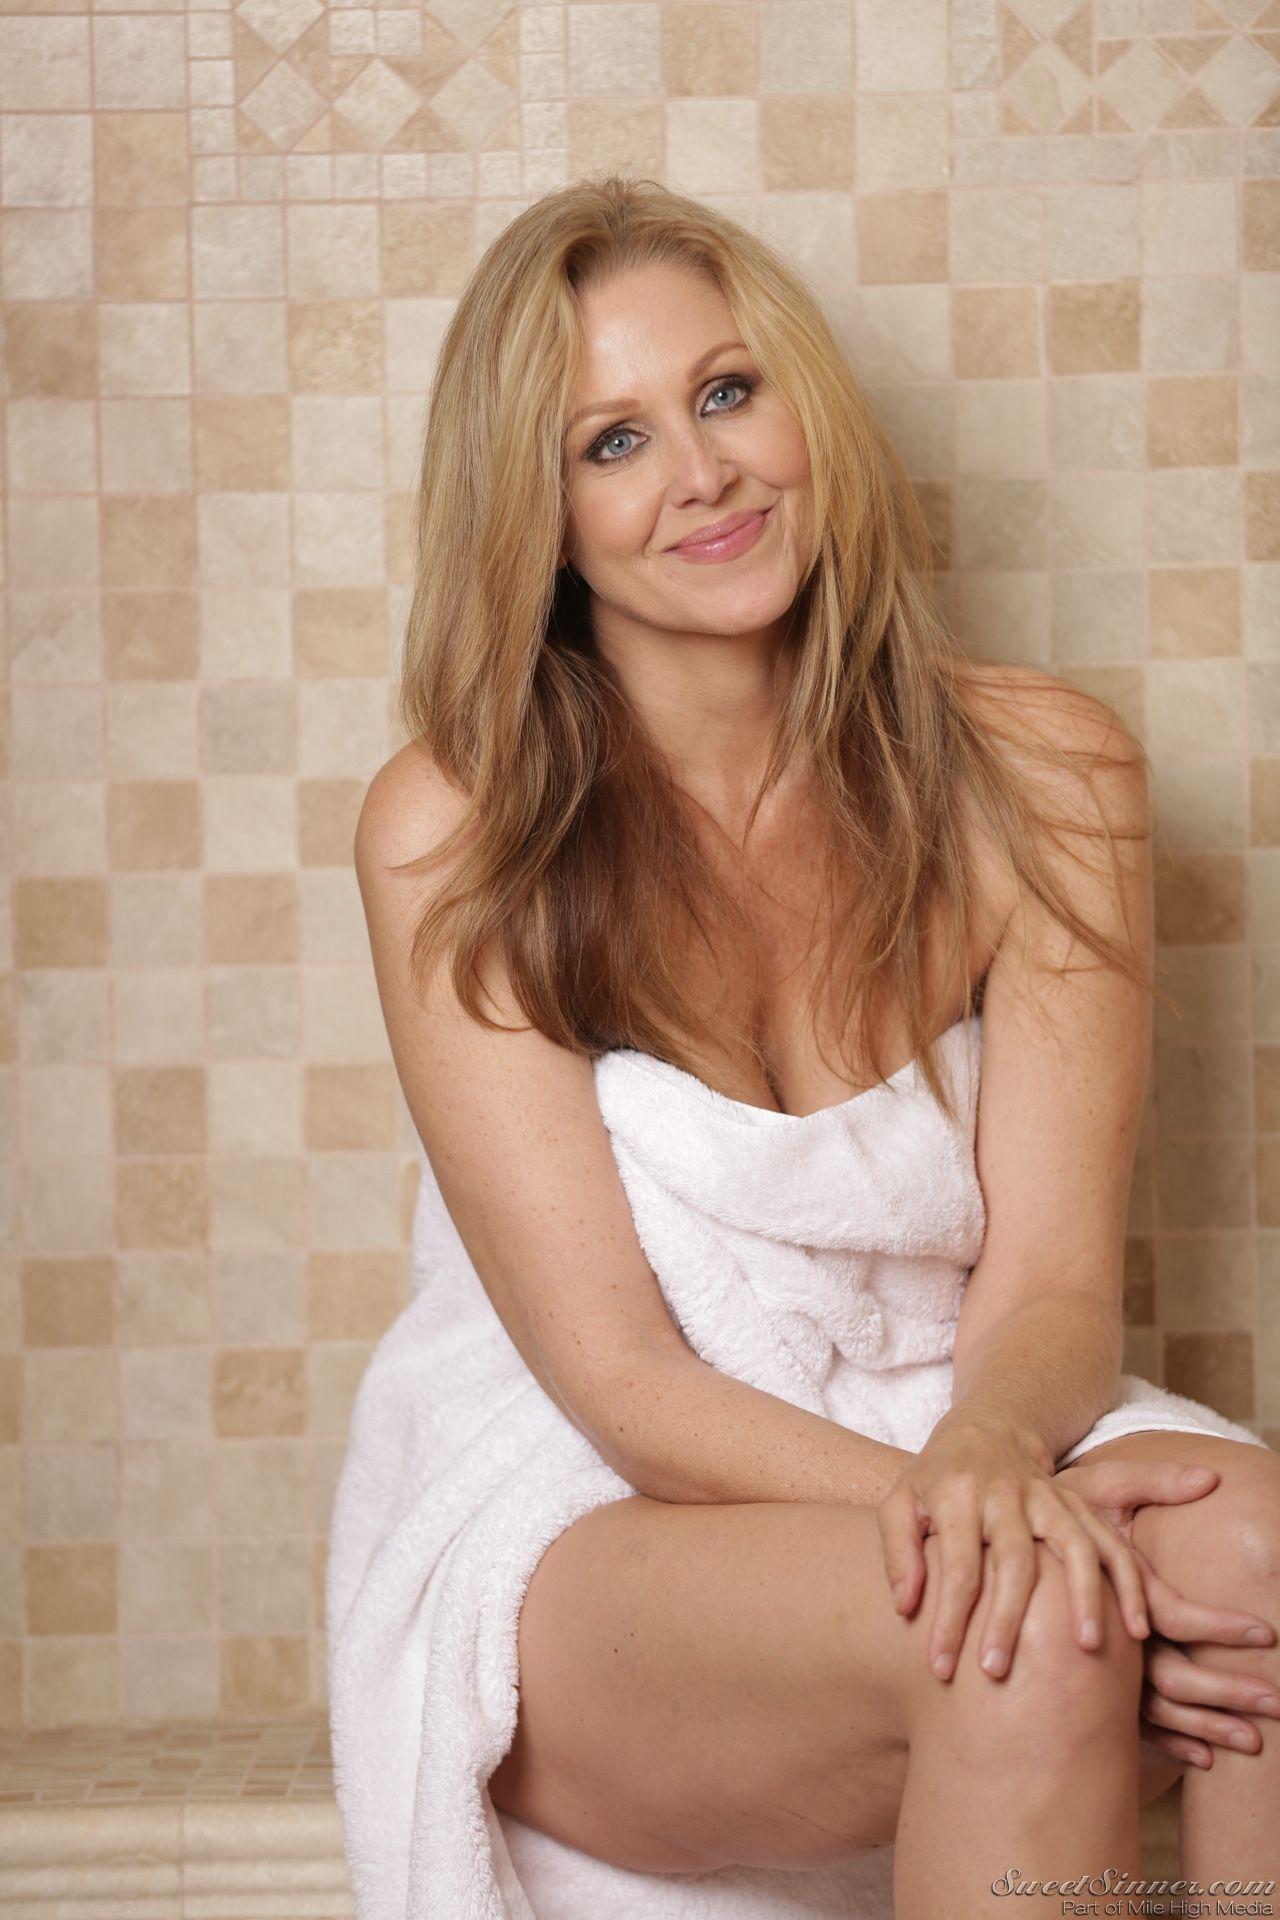 Speaking, would julia ann blonde beauty authoritative